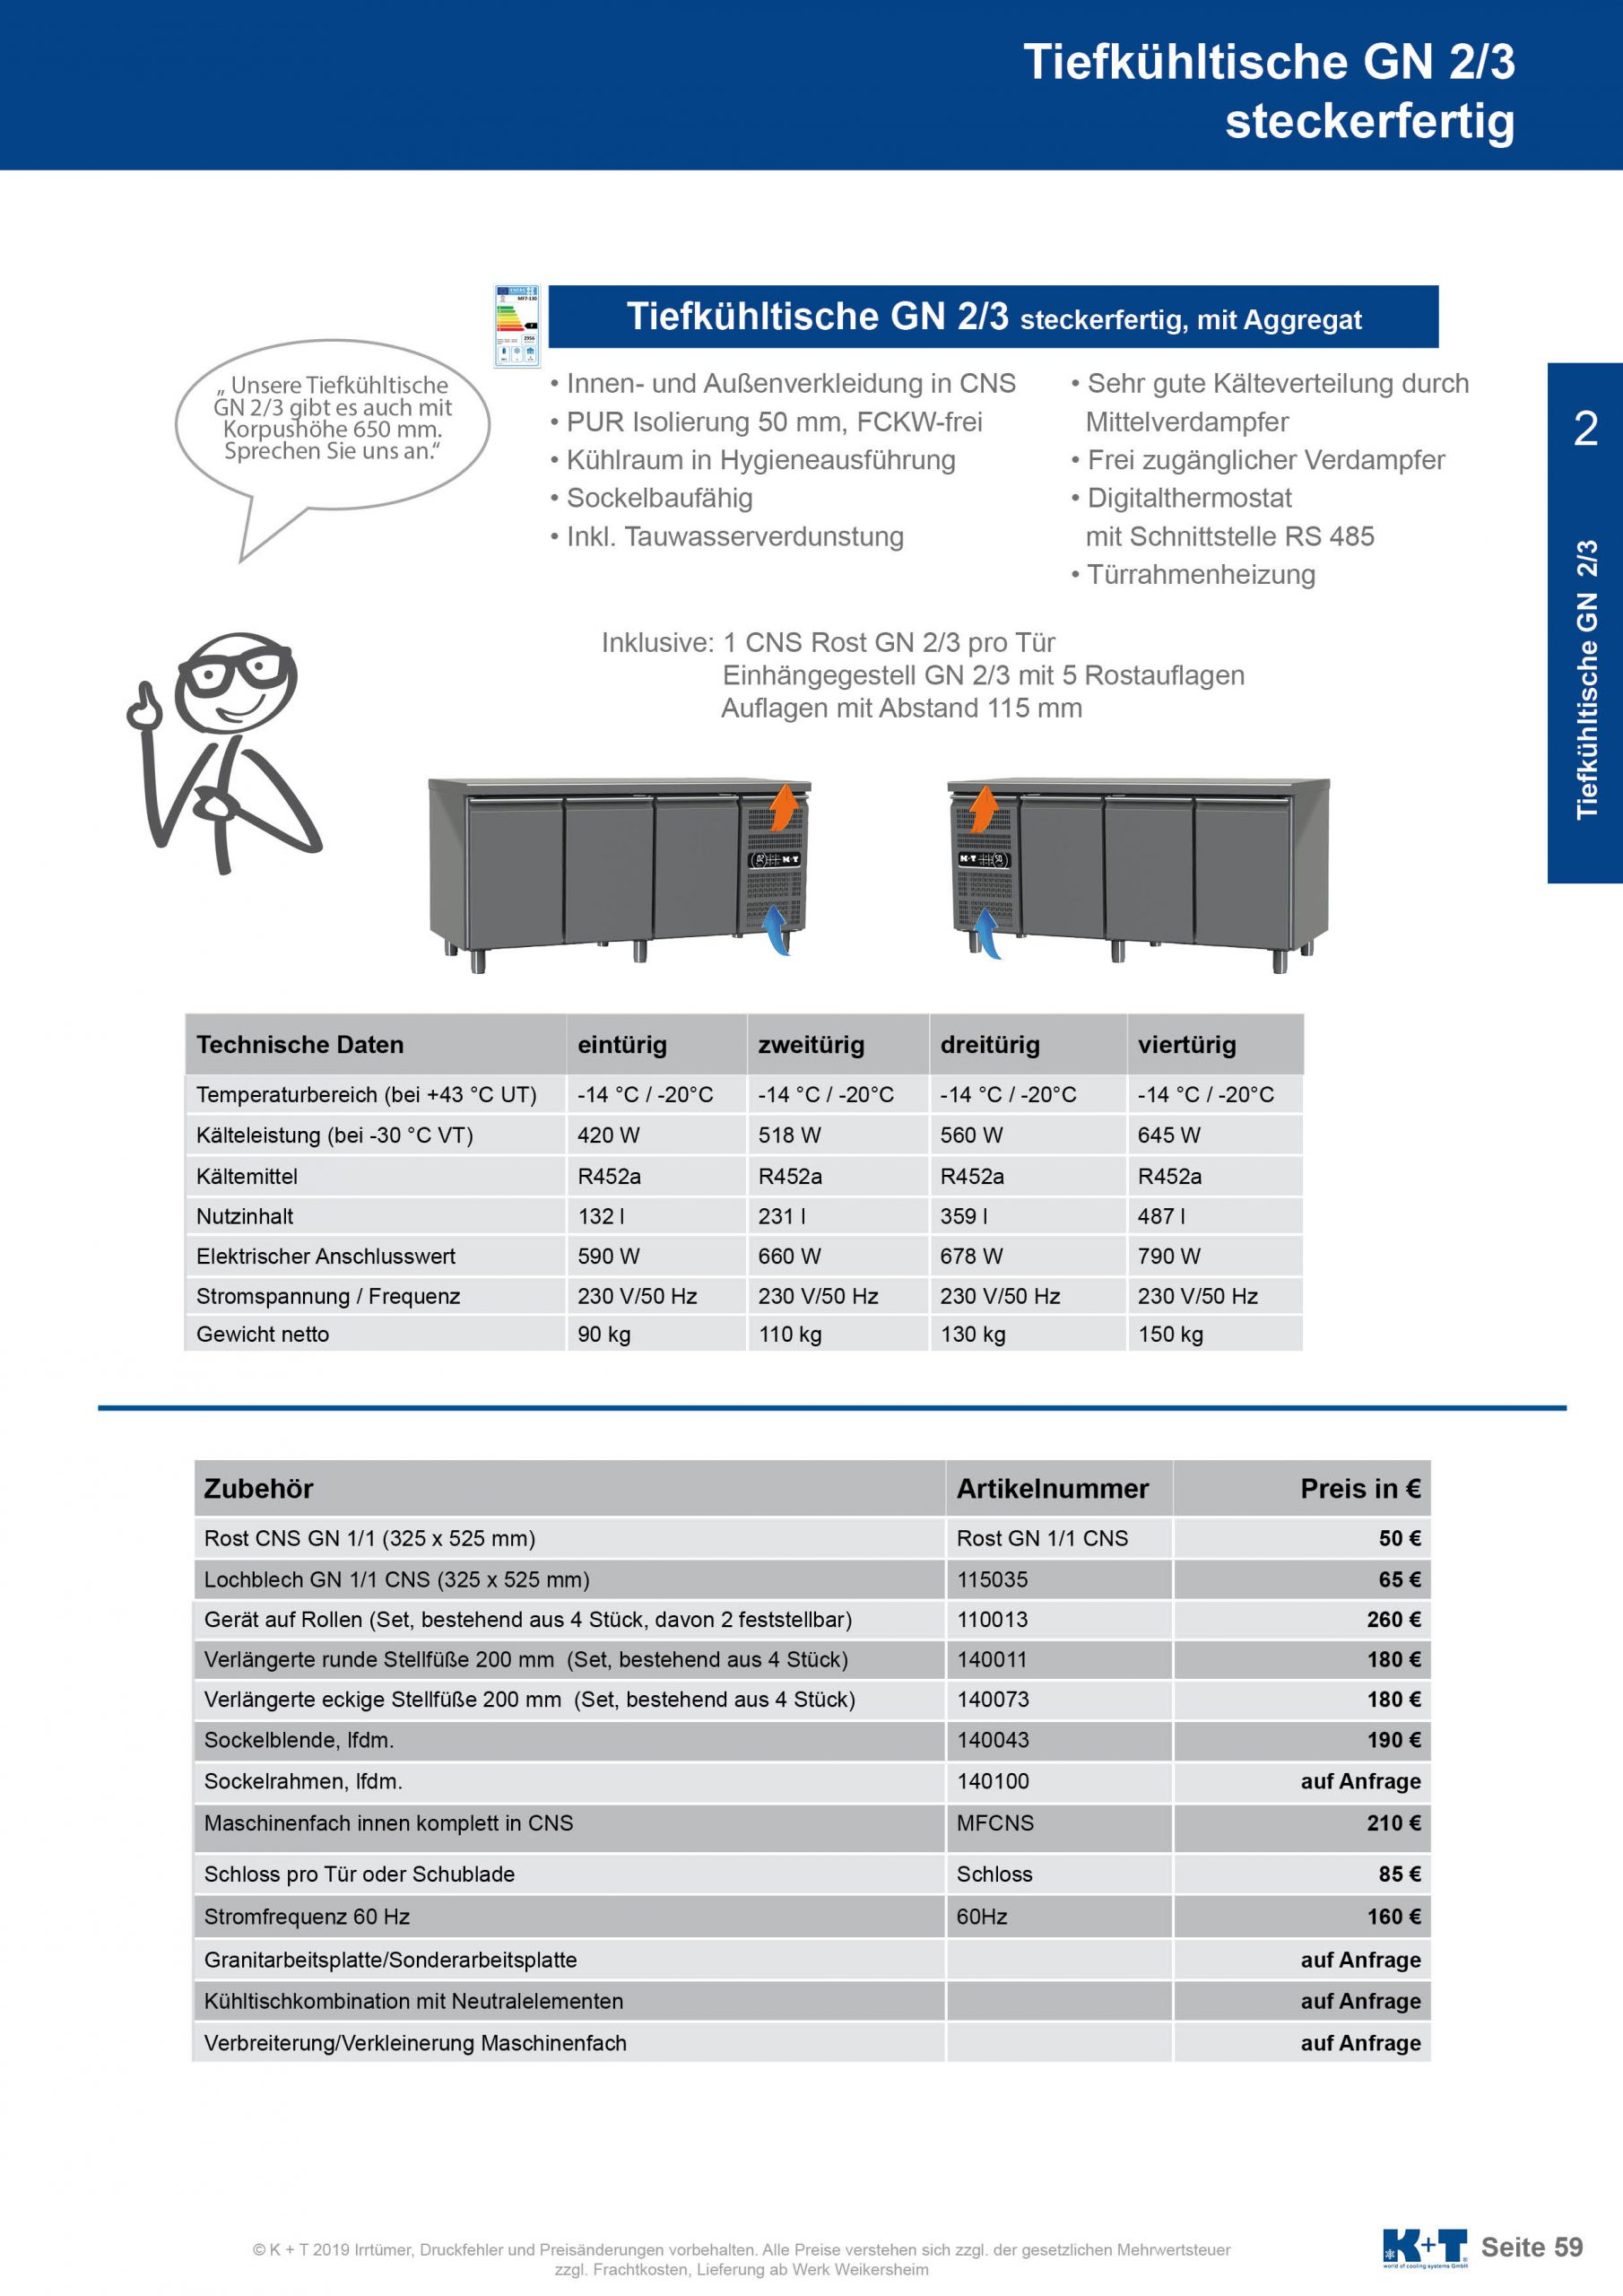 Tiefkühltisch GN 2_3 Korpus 700 steckerfertig 2